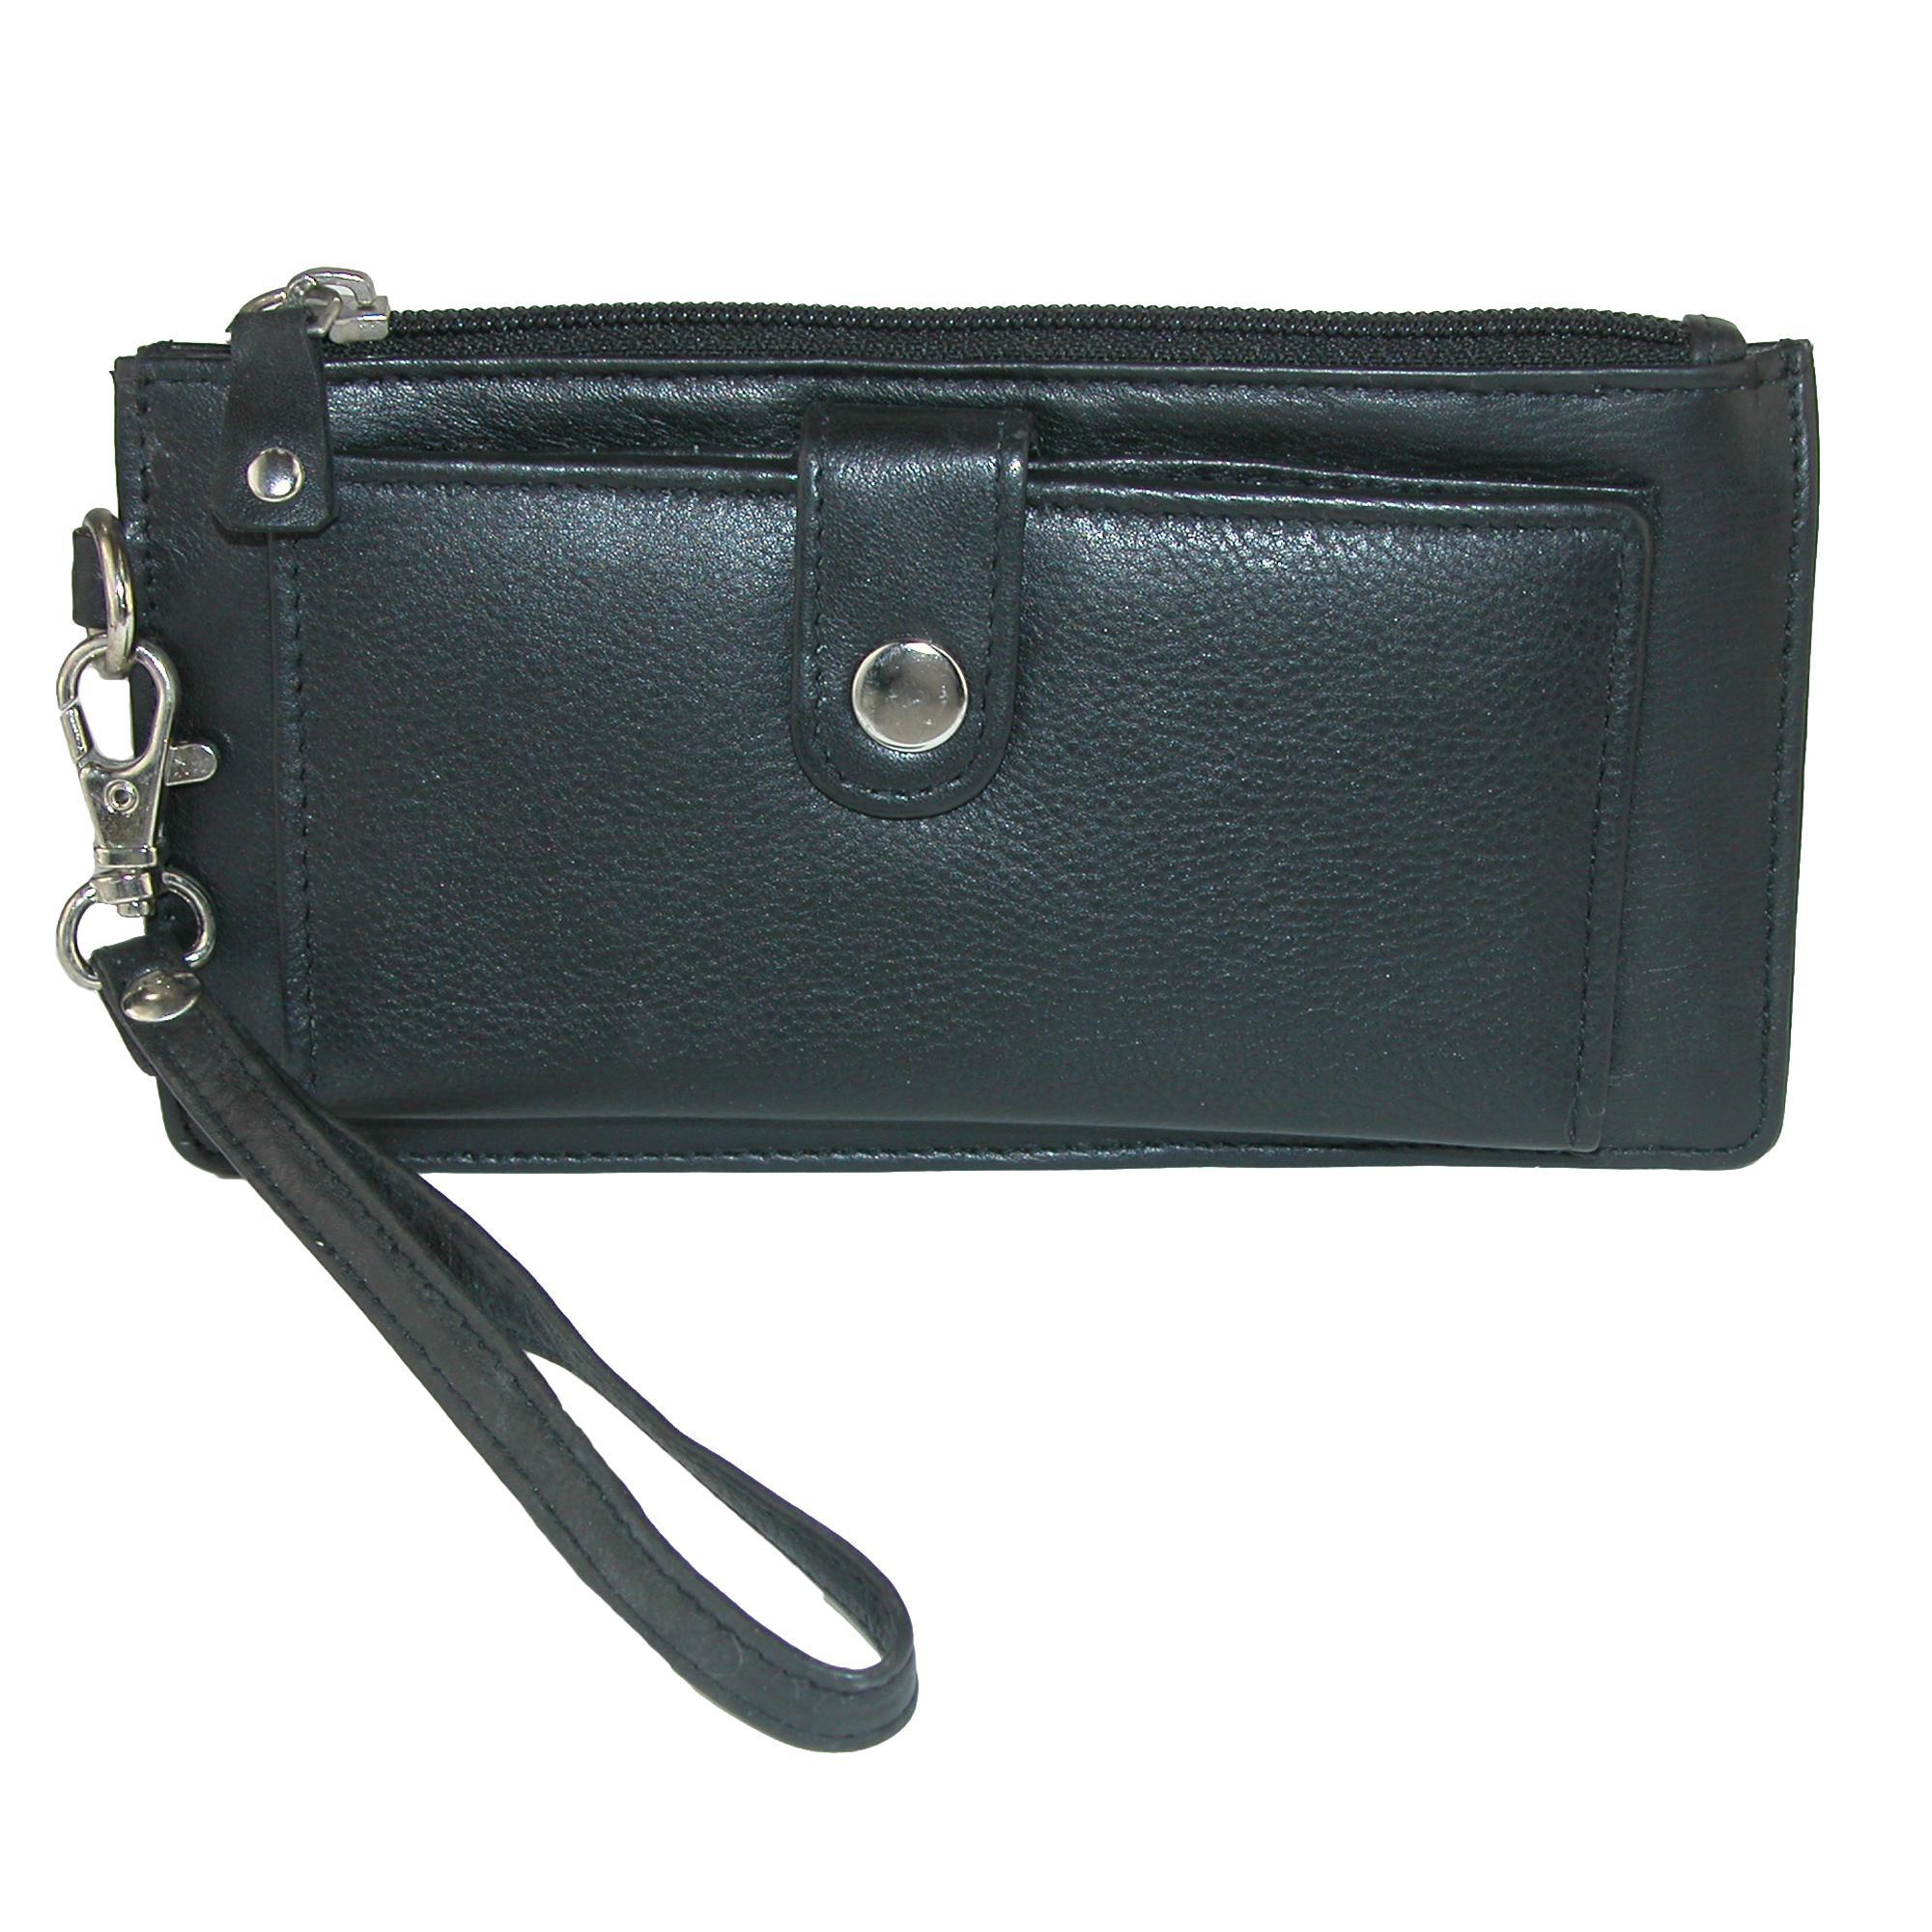 Ctm Women's Leather Top Zip Wallet With Front Organizer